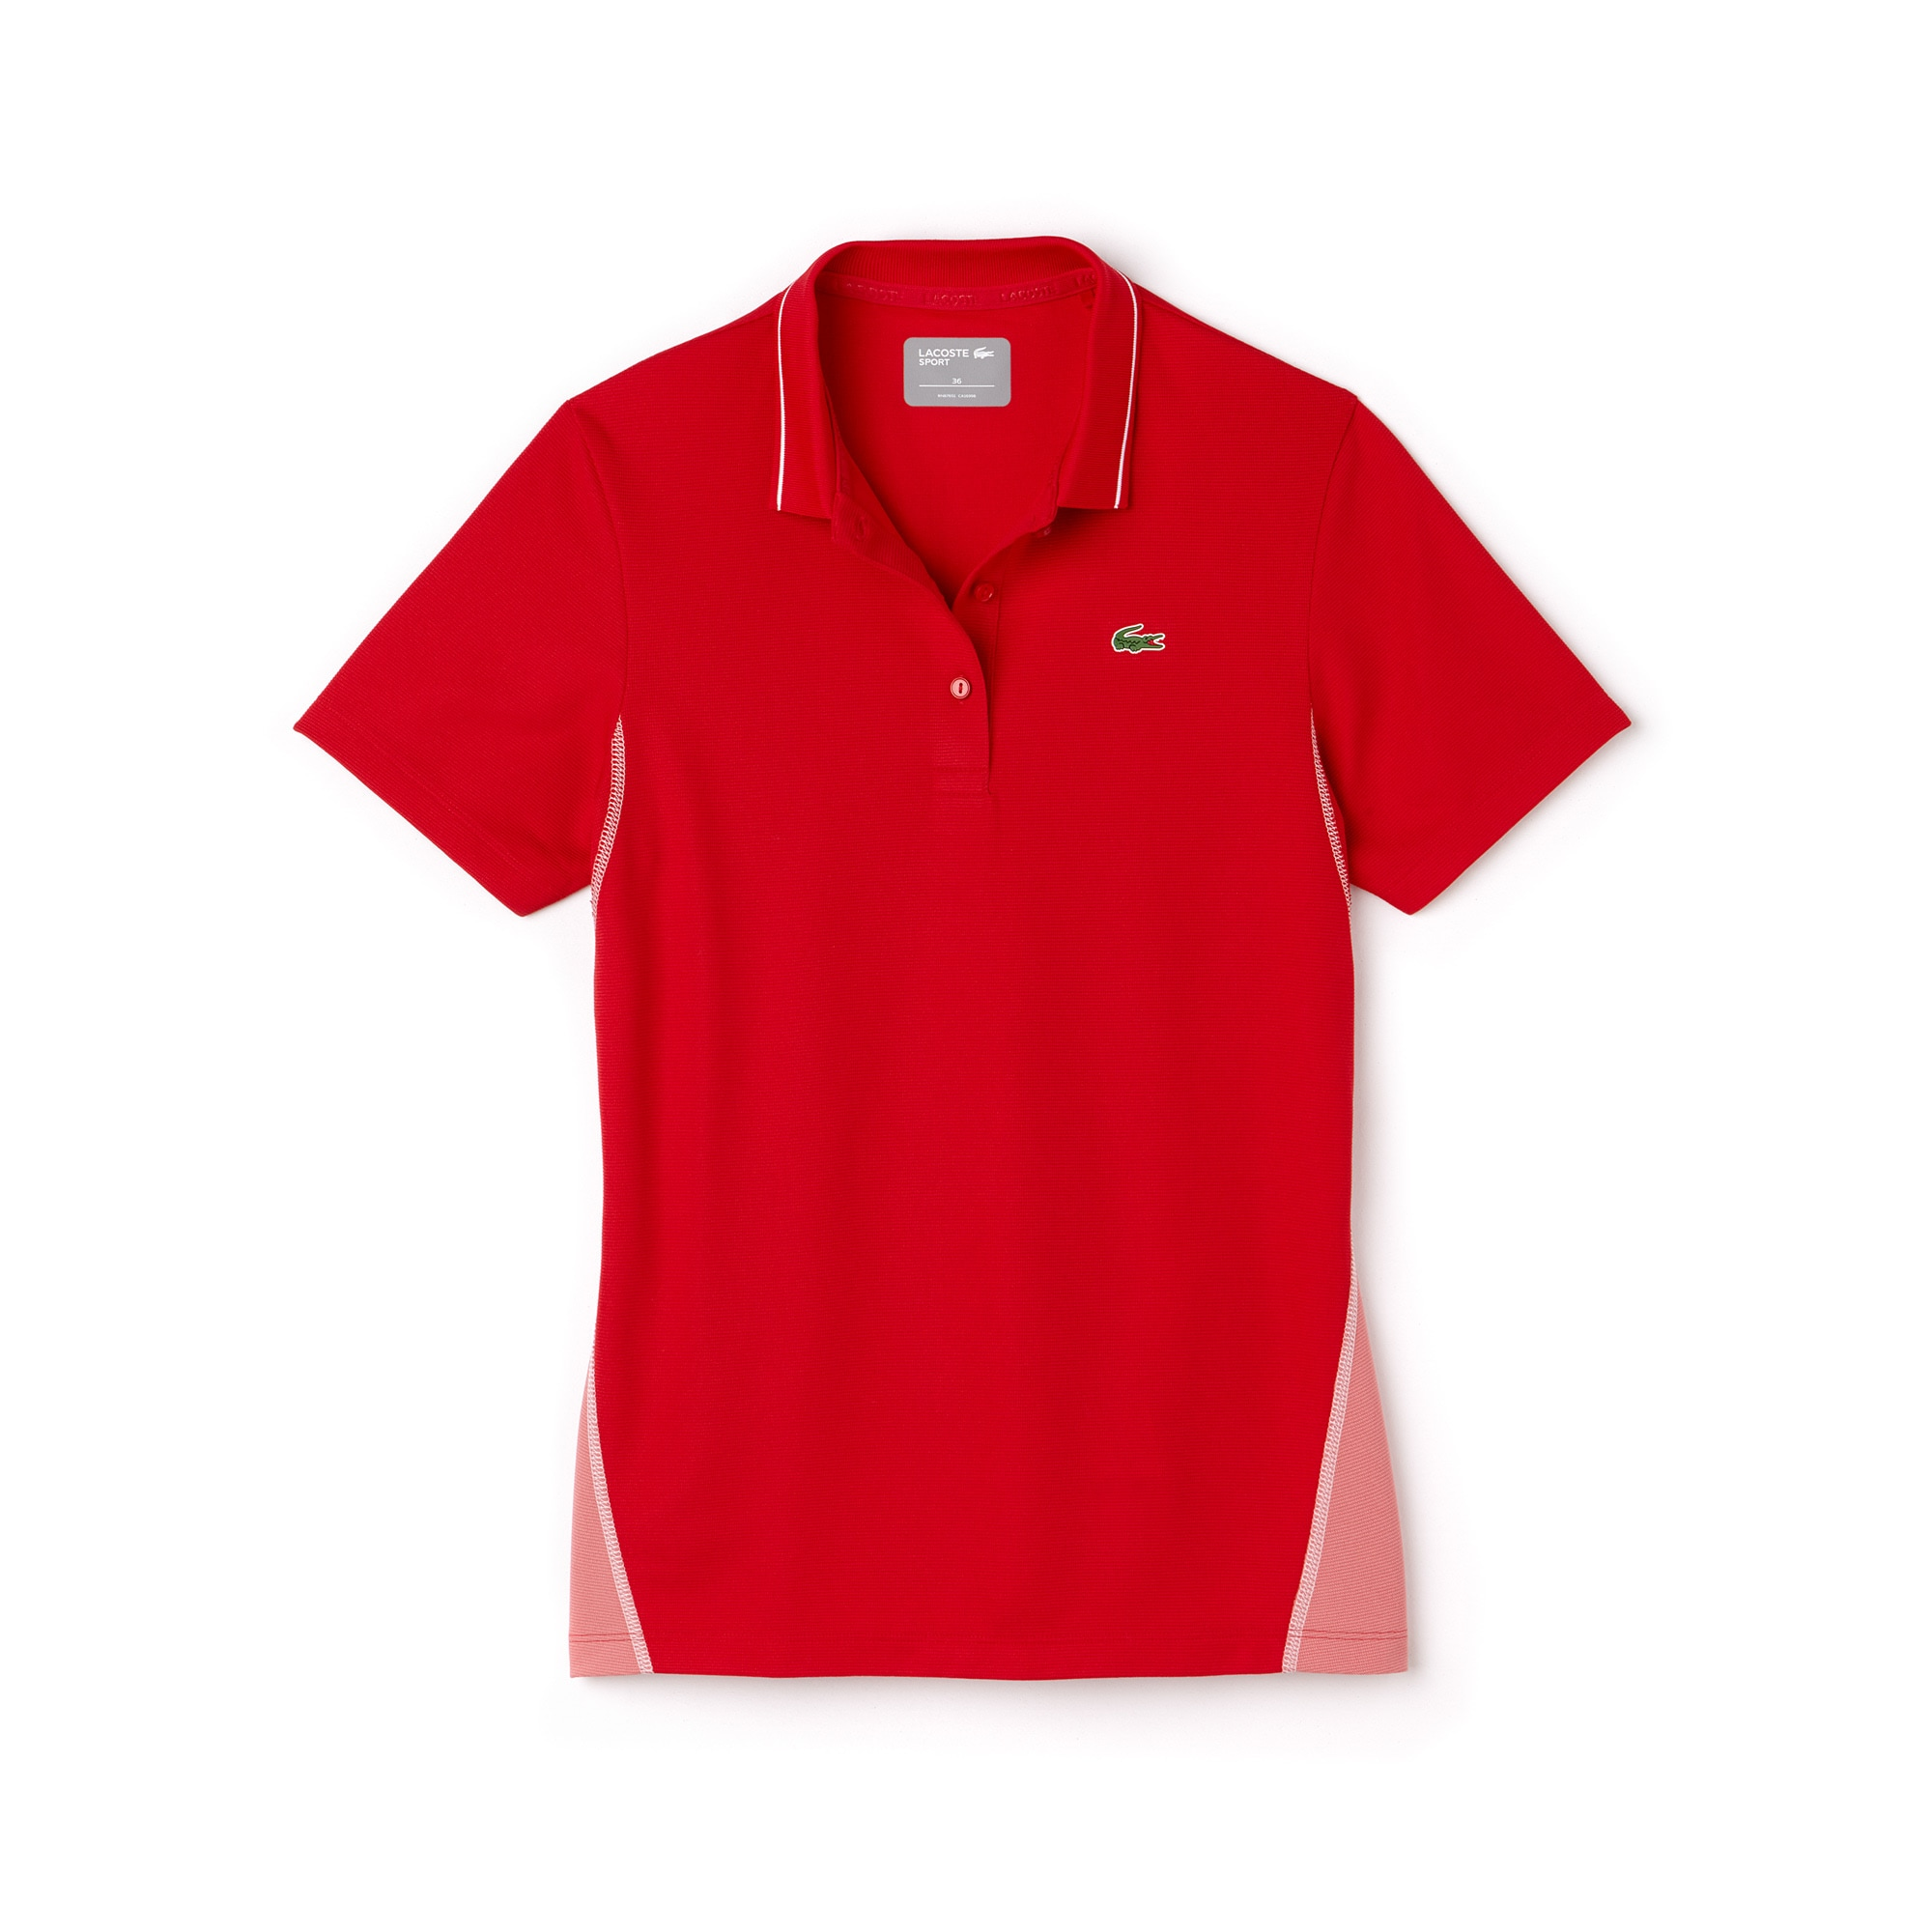 Women's Lacoste SPORT Technical Cotton Knit Golf Polo Shirt